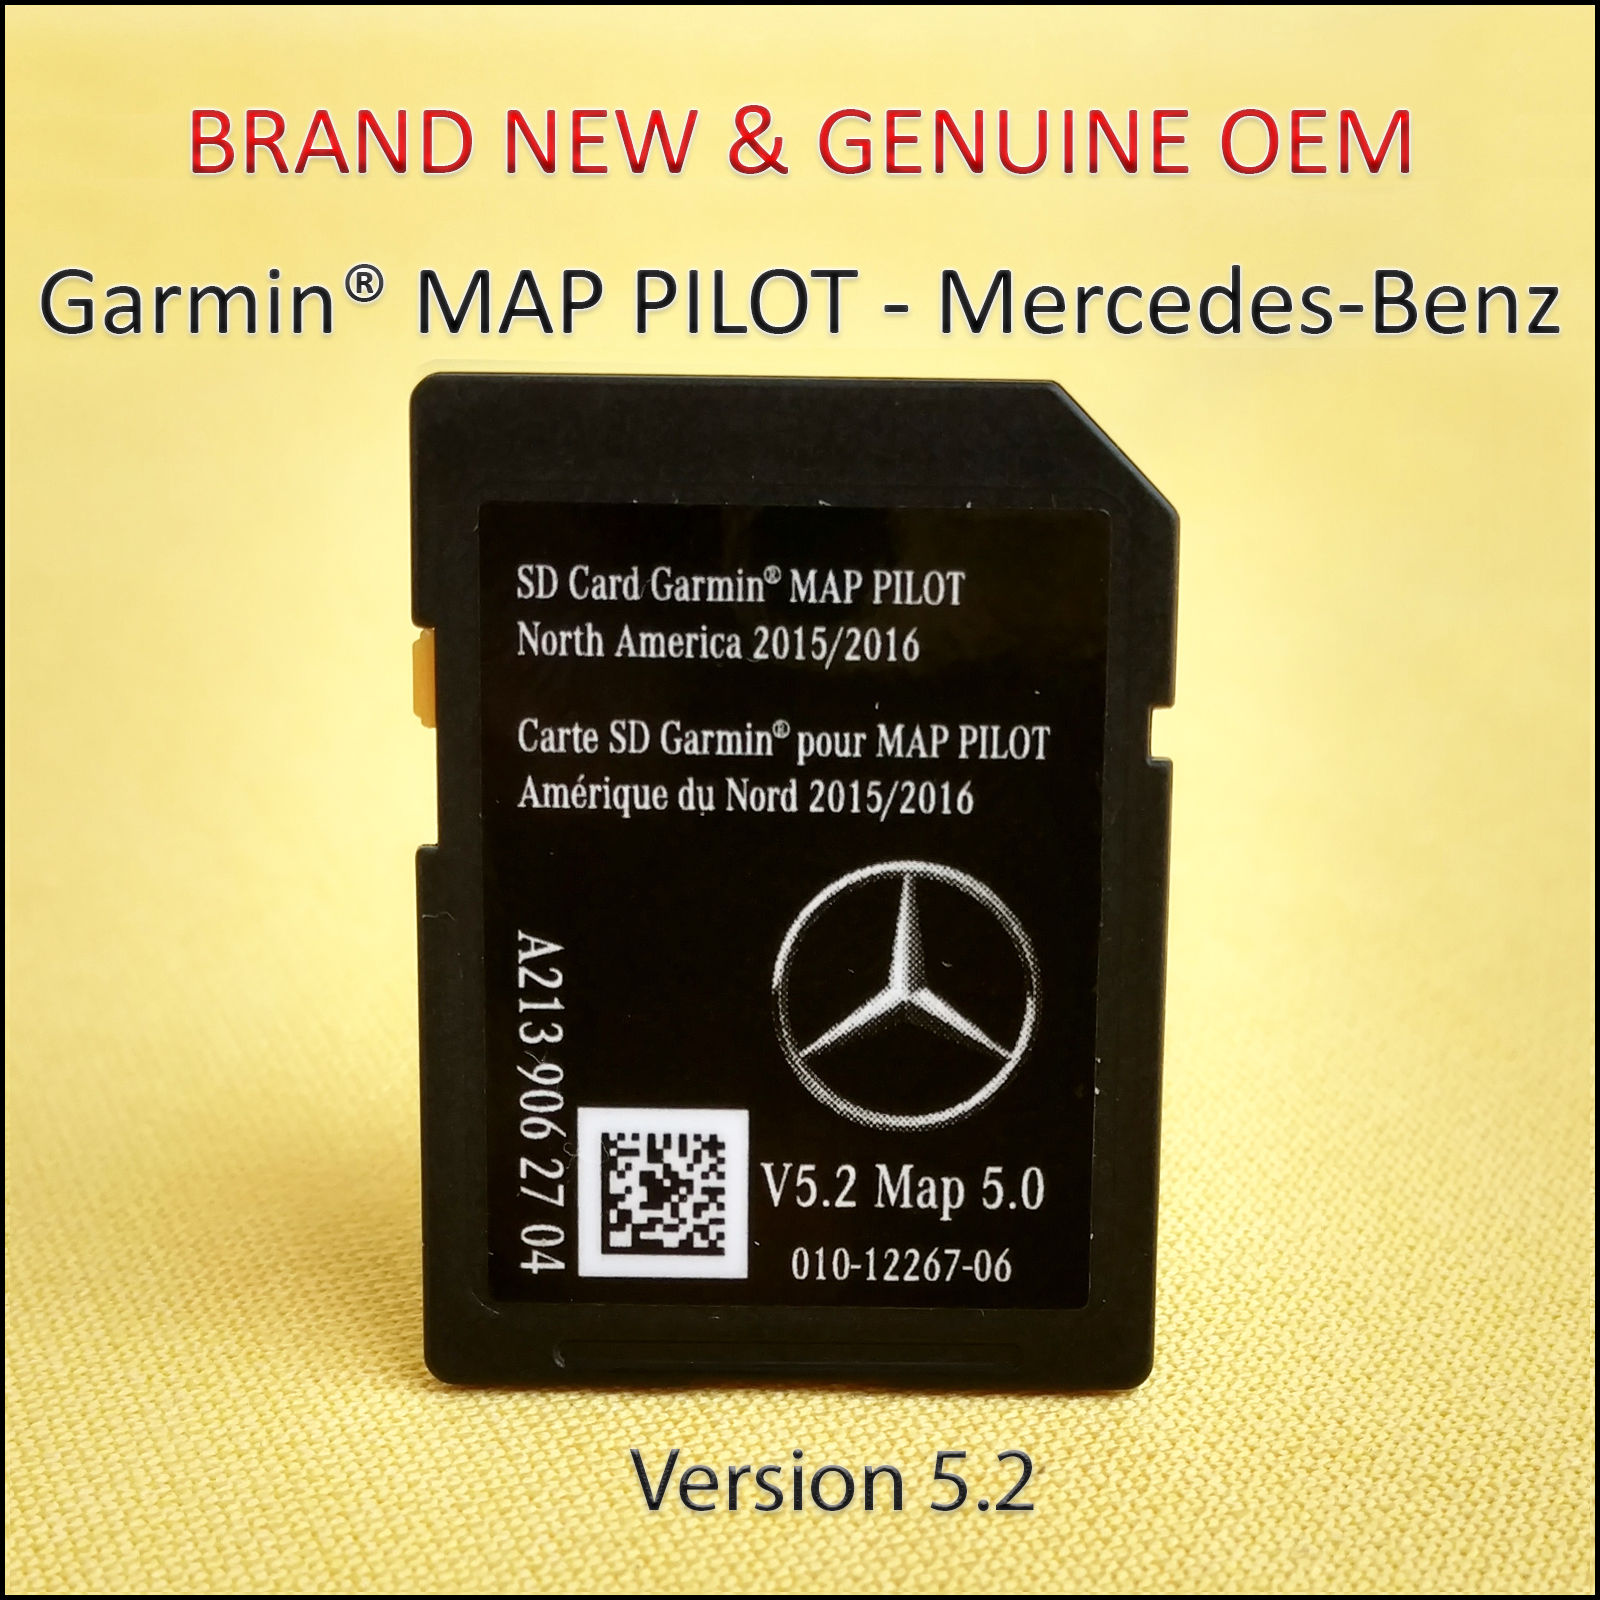 Awesome Mercedes Benz SD Card Garmin Map Pilot 2015 2016 2017 E GLC on continental usa map, disney usa map, amazon usa map, columbia usa map, microsoft map, magellan map, netgear map, gps usa map, apple usa map, michelin usa map, puma usa map, google usa map, kensington map, creative usa map, navigon usa map,